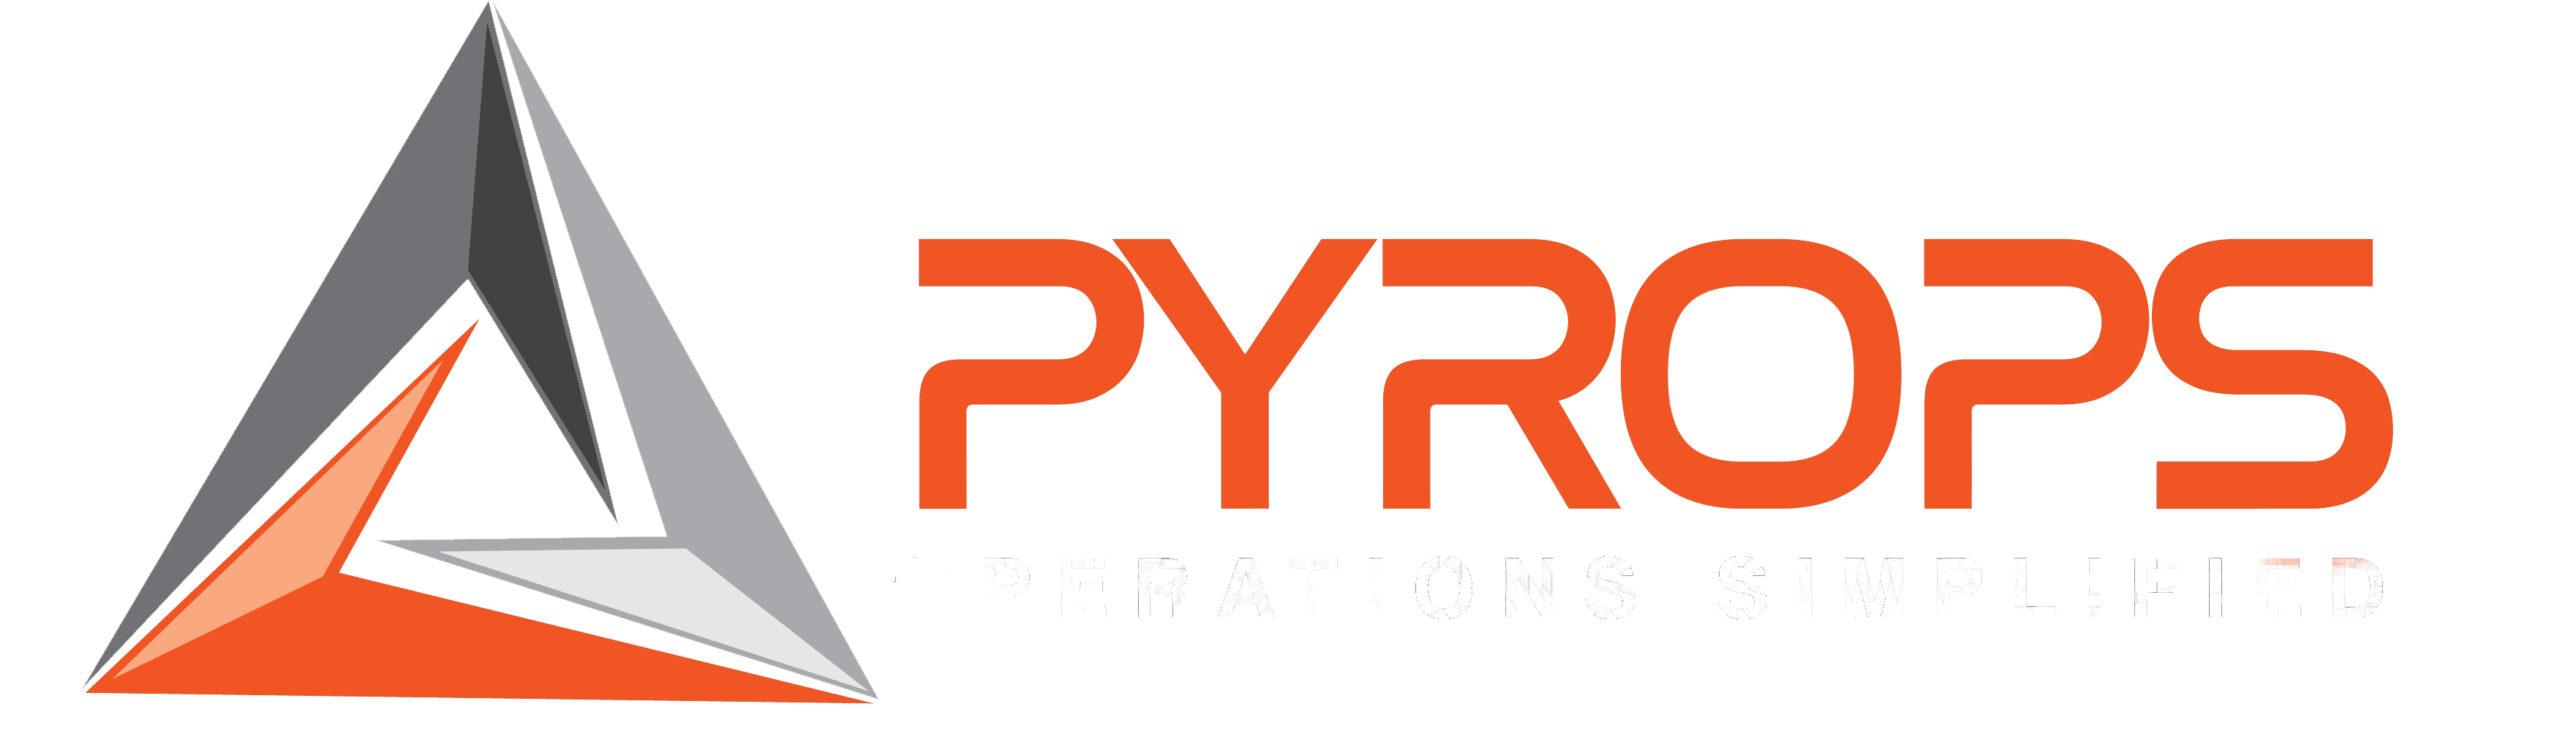 Pyrops